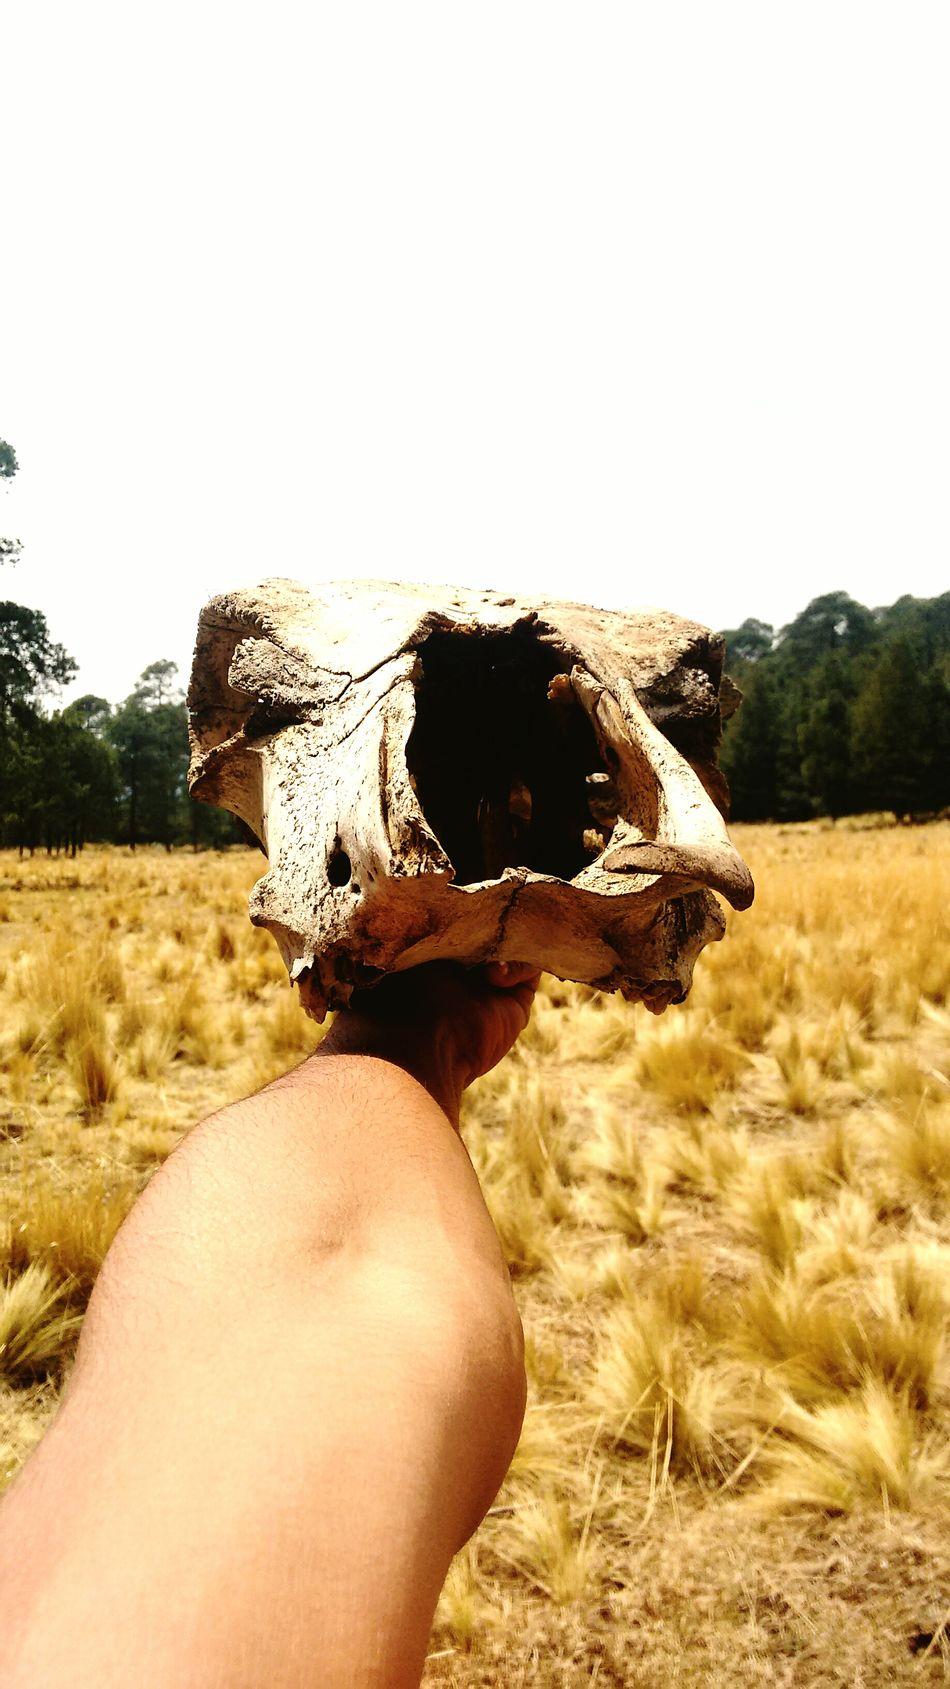 Day Paisajesbonitos Toros Y Caballos Cráneo Hello World LSD .. Bosque Y Vida Alucination One Animal Animal Themes Domestic Animals Trippy Beauty In Nature Nature